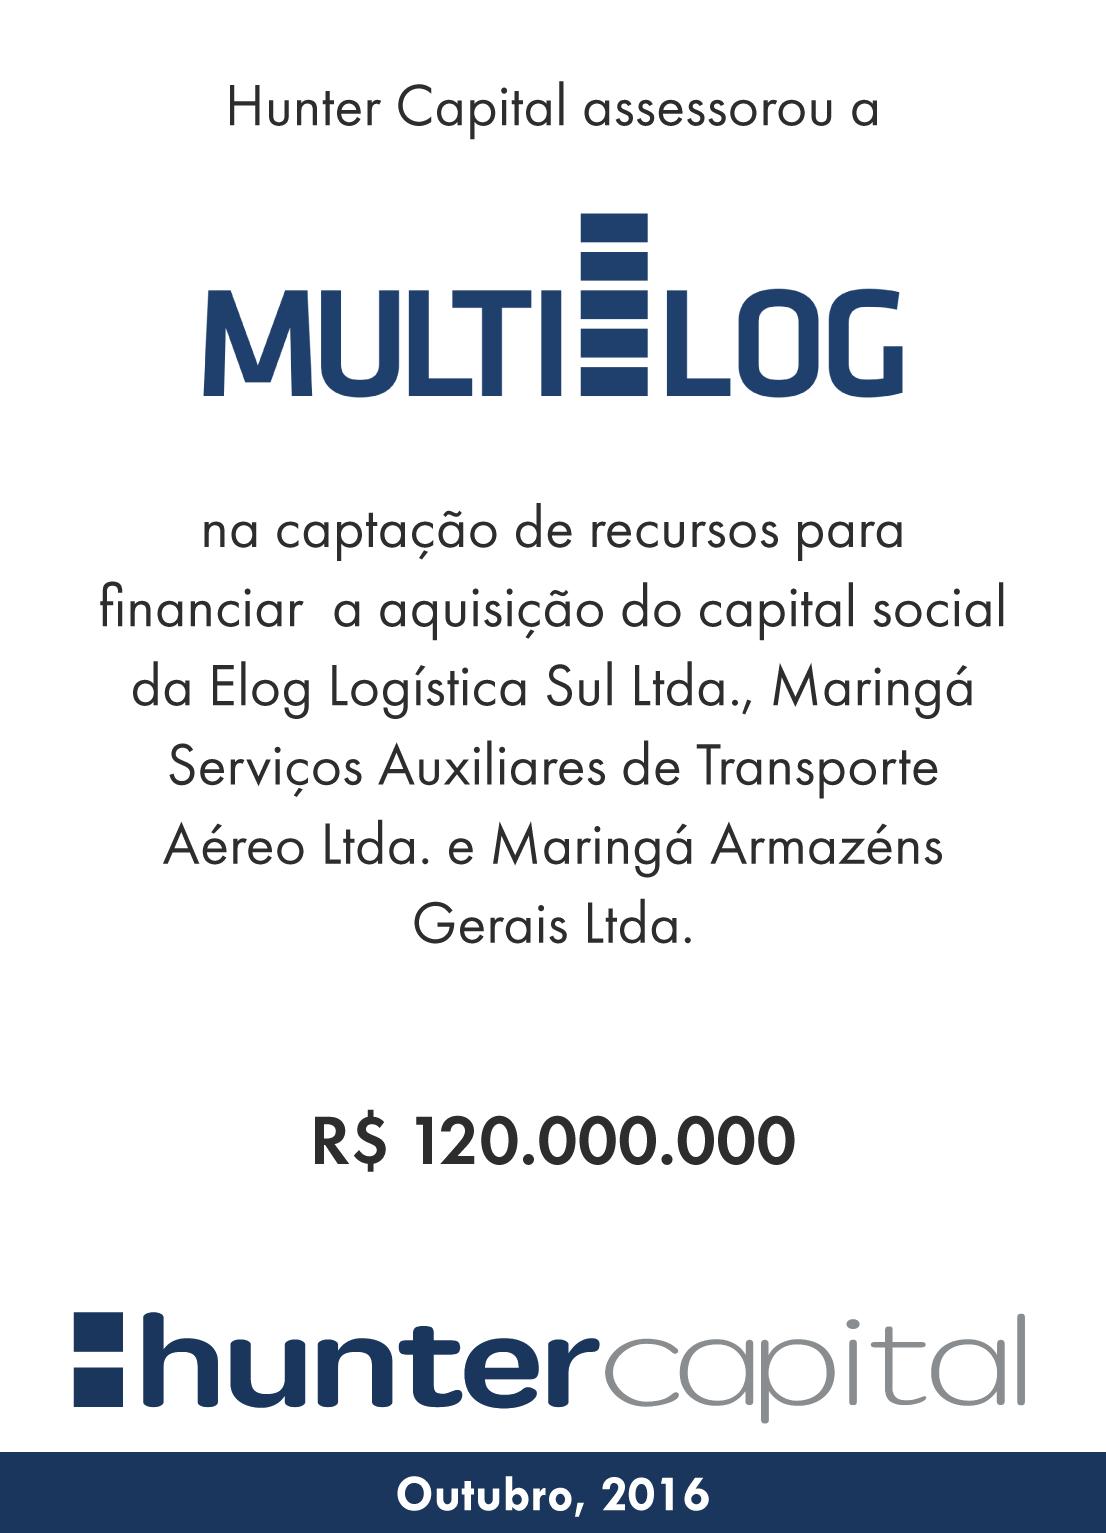 Tombstone Multilog Dívida.png